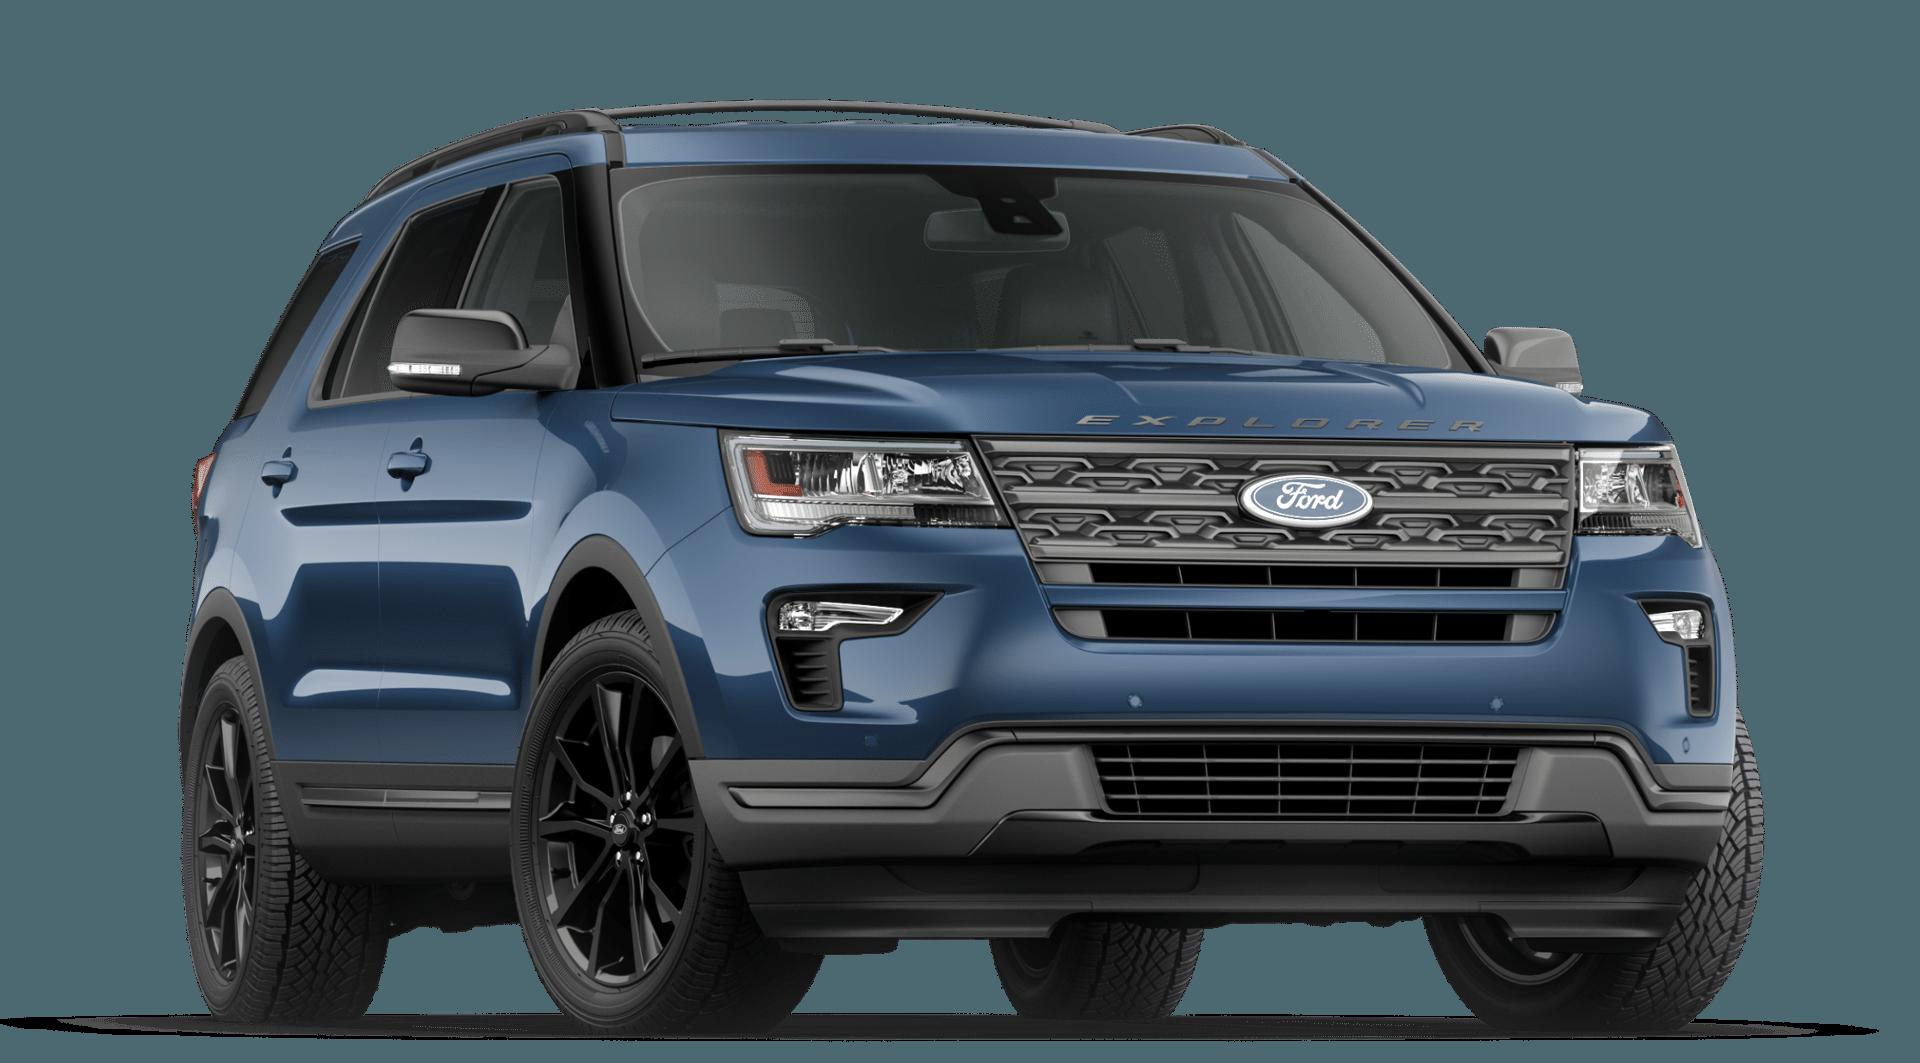 Exterior View of 2019 Explorer 2020 ford explorer, Ford